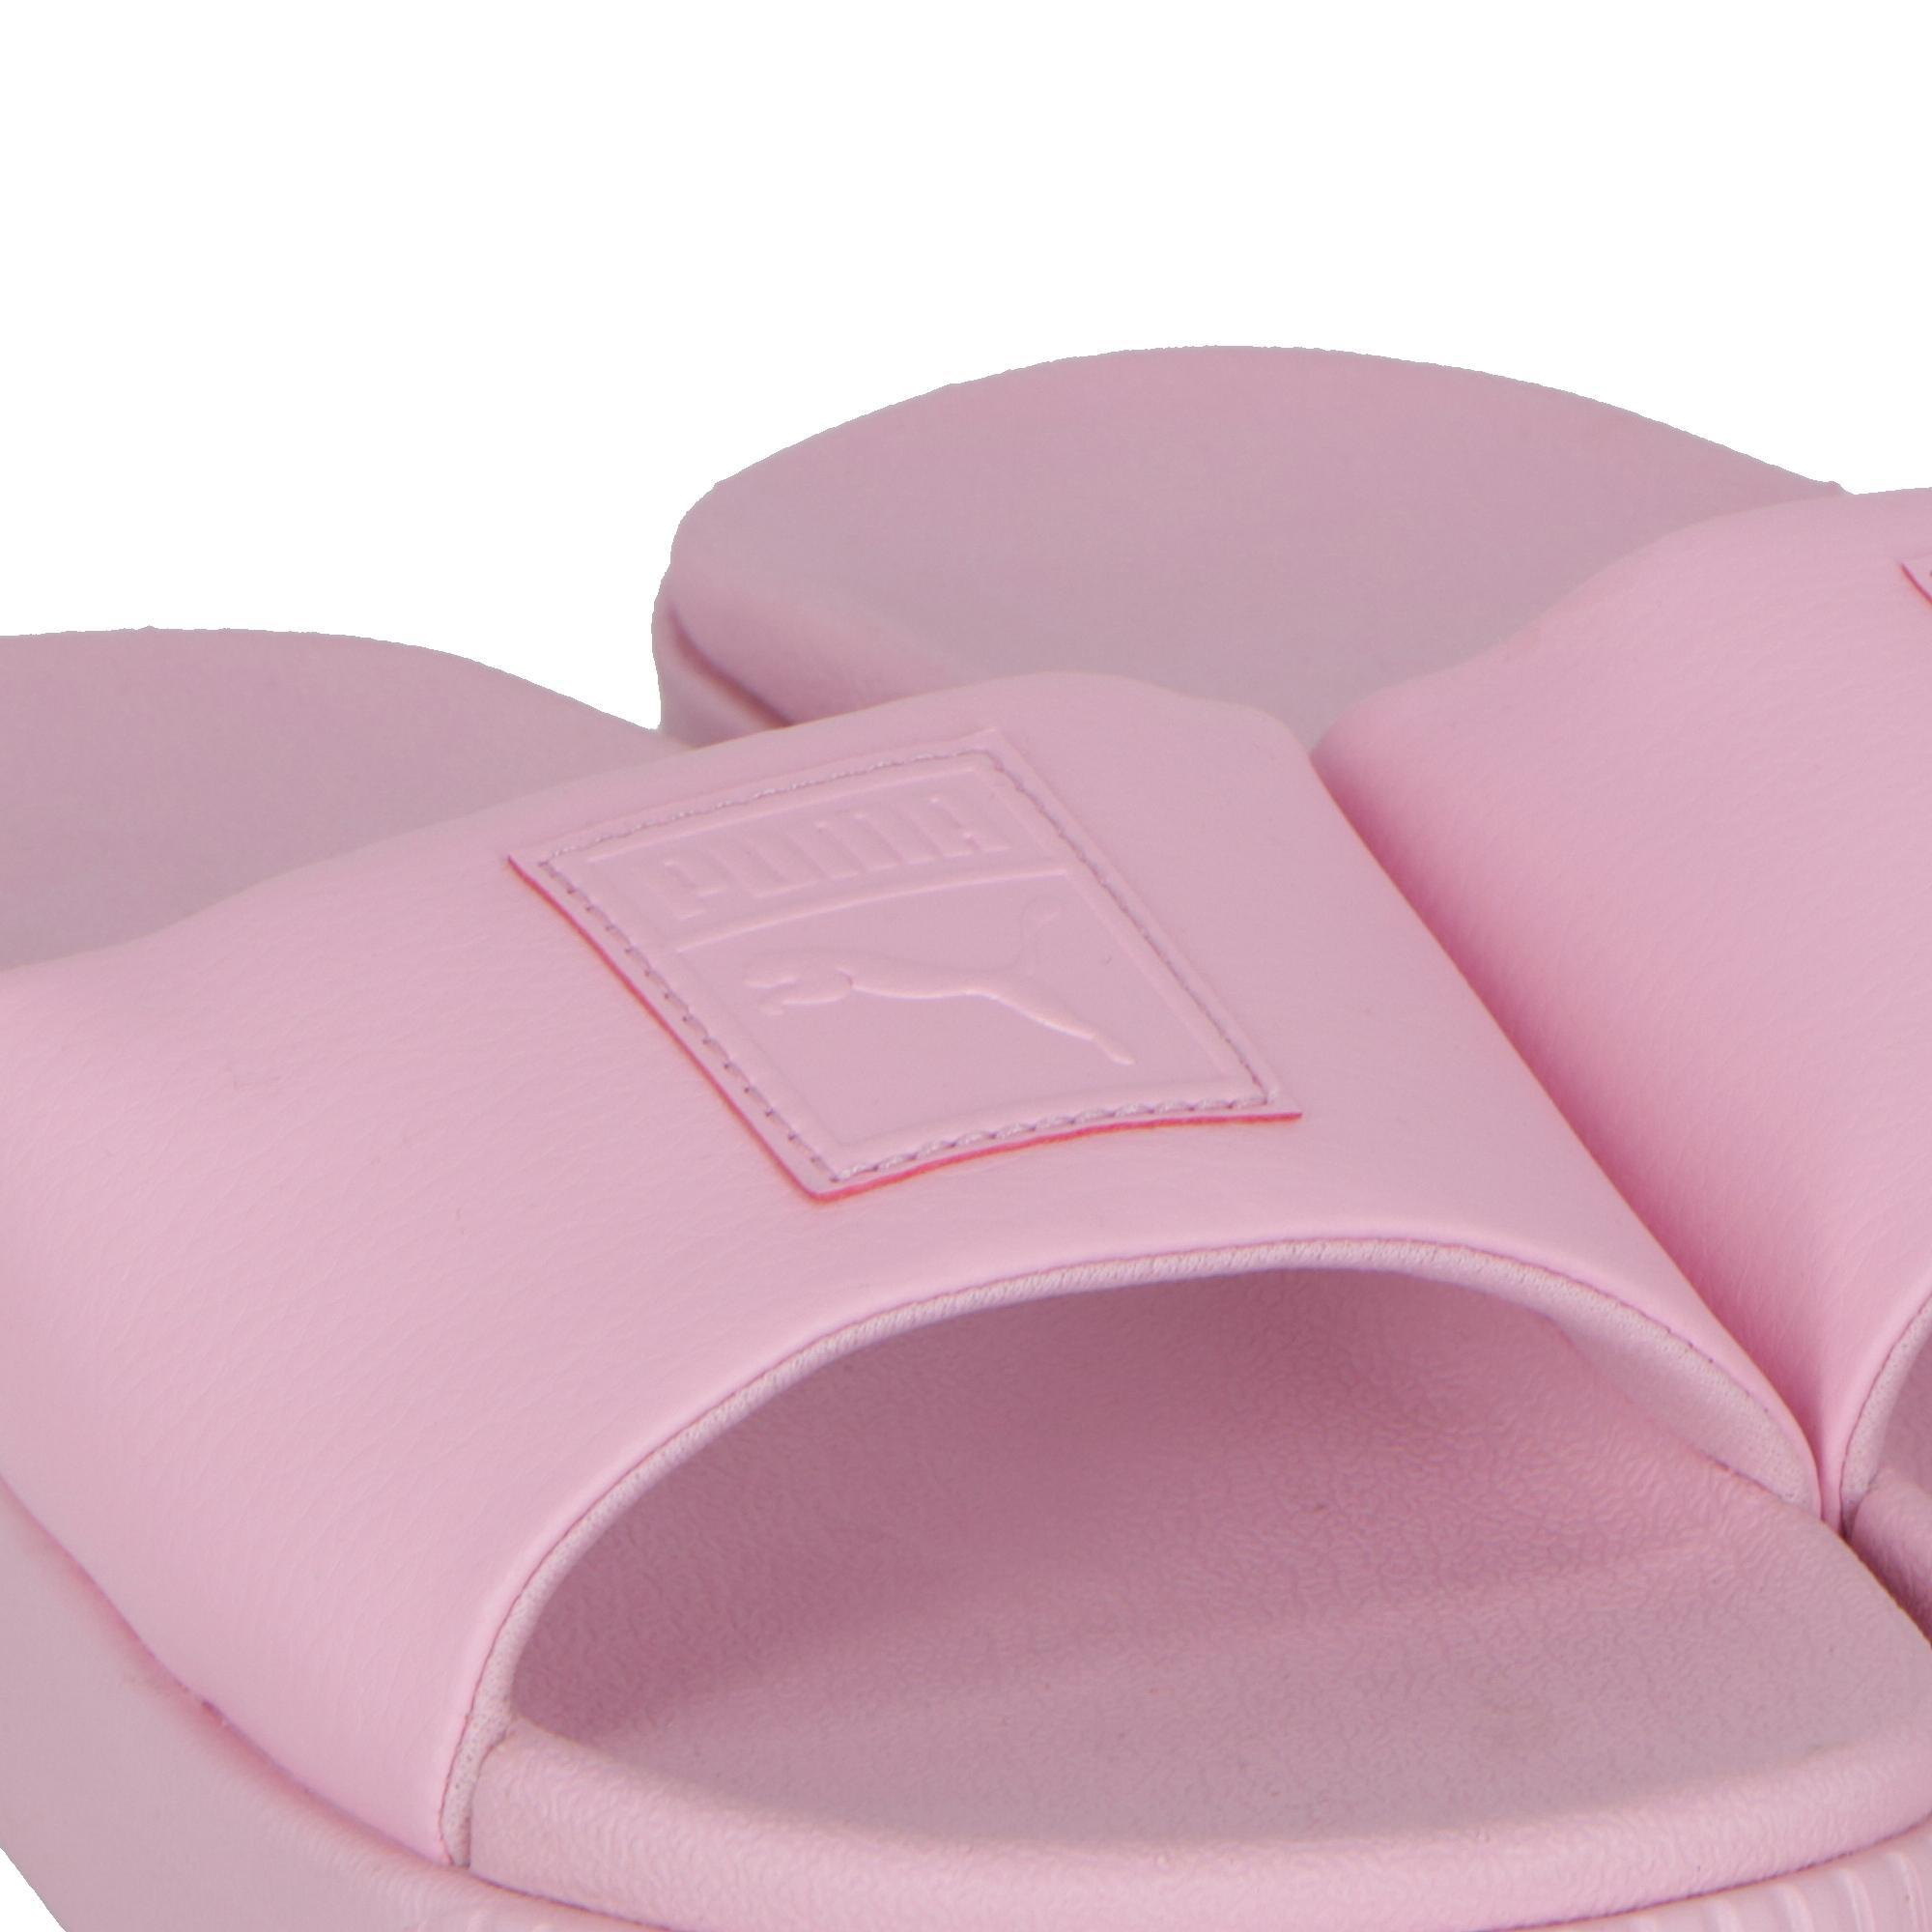 797f2259c2 Puma Platform Slide Wns Pale Pink | Treesse